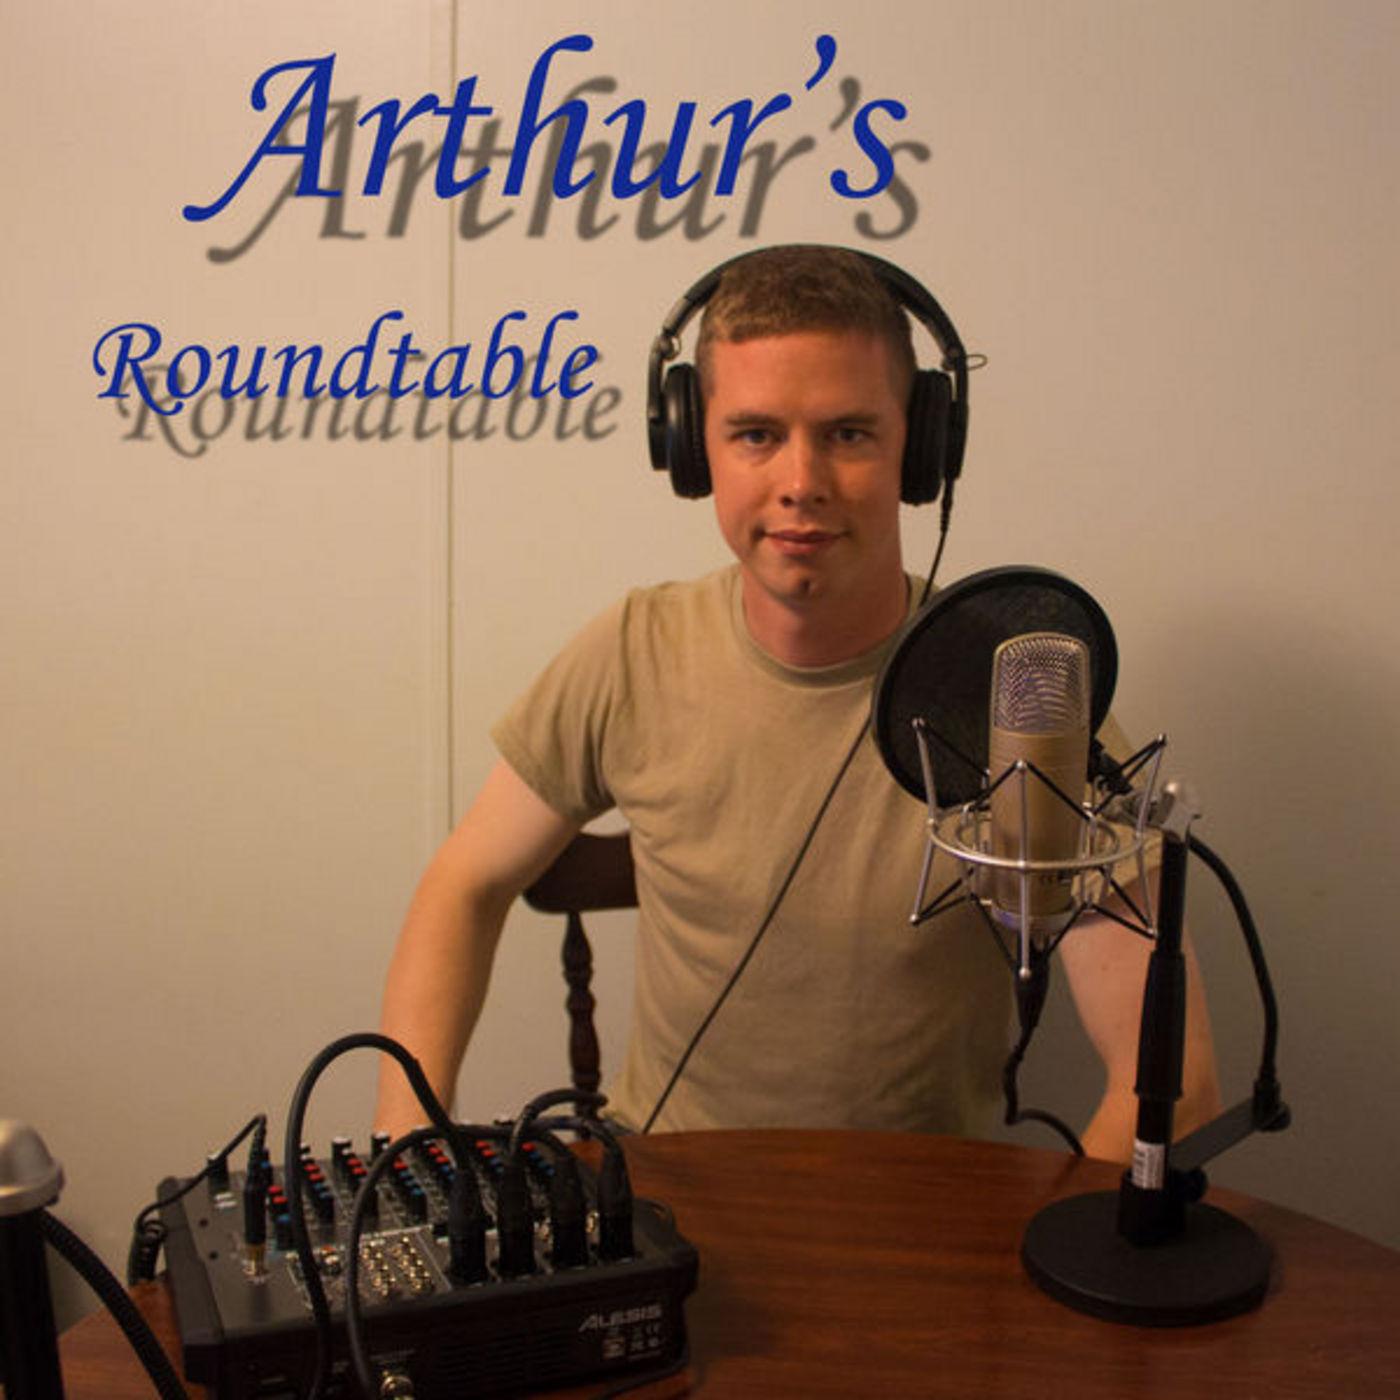 <![CDATA[Arthur's Roundtable]]>